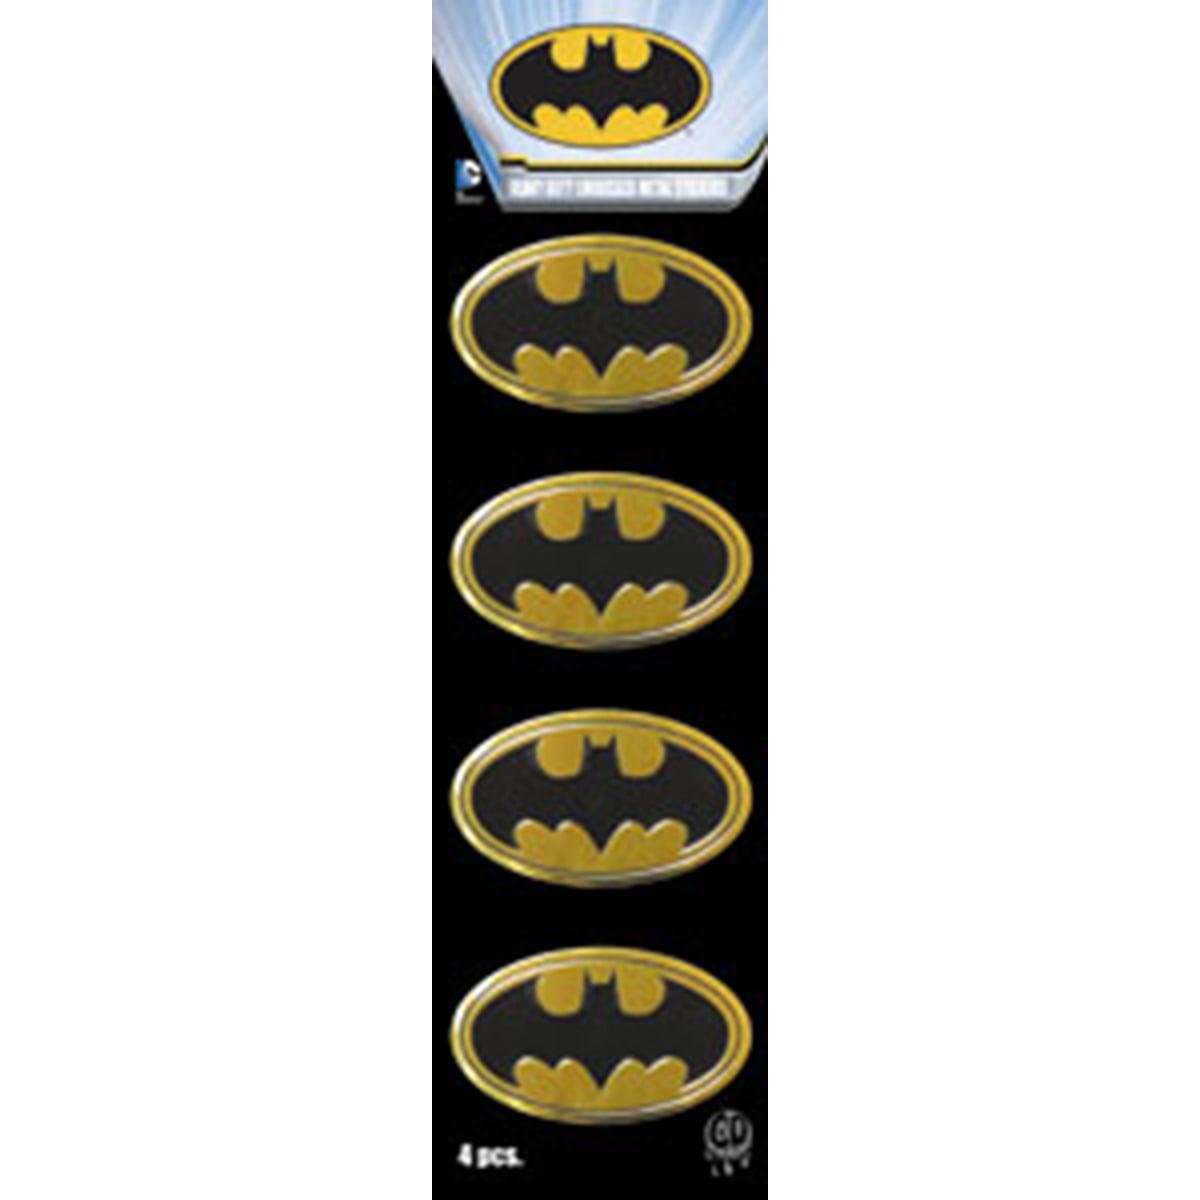 "Dc Comics Licensed Heavy Duty Embossed Metal Stickers 4/Pkg-Batman Logo 1""X1.5"" - image 1 de 1"